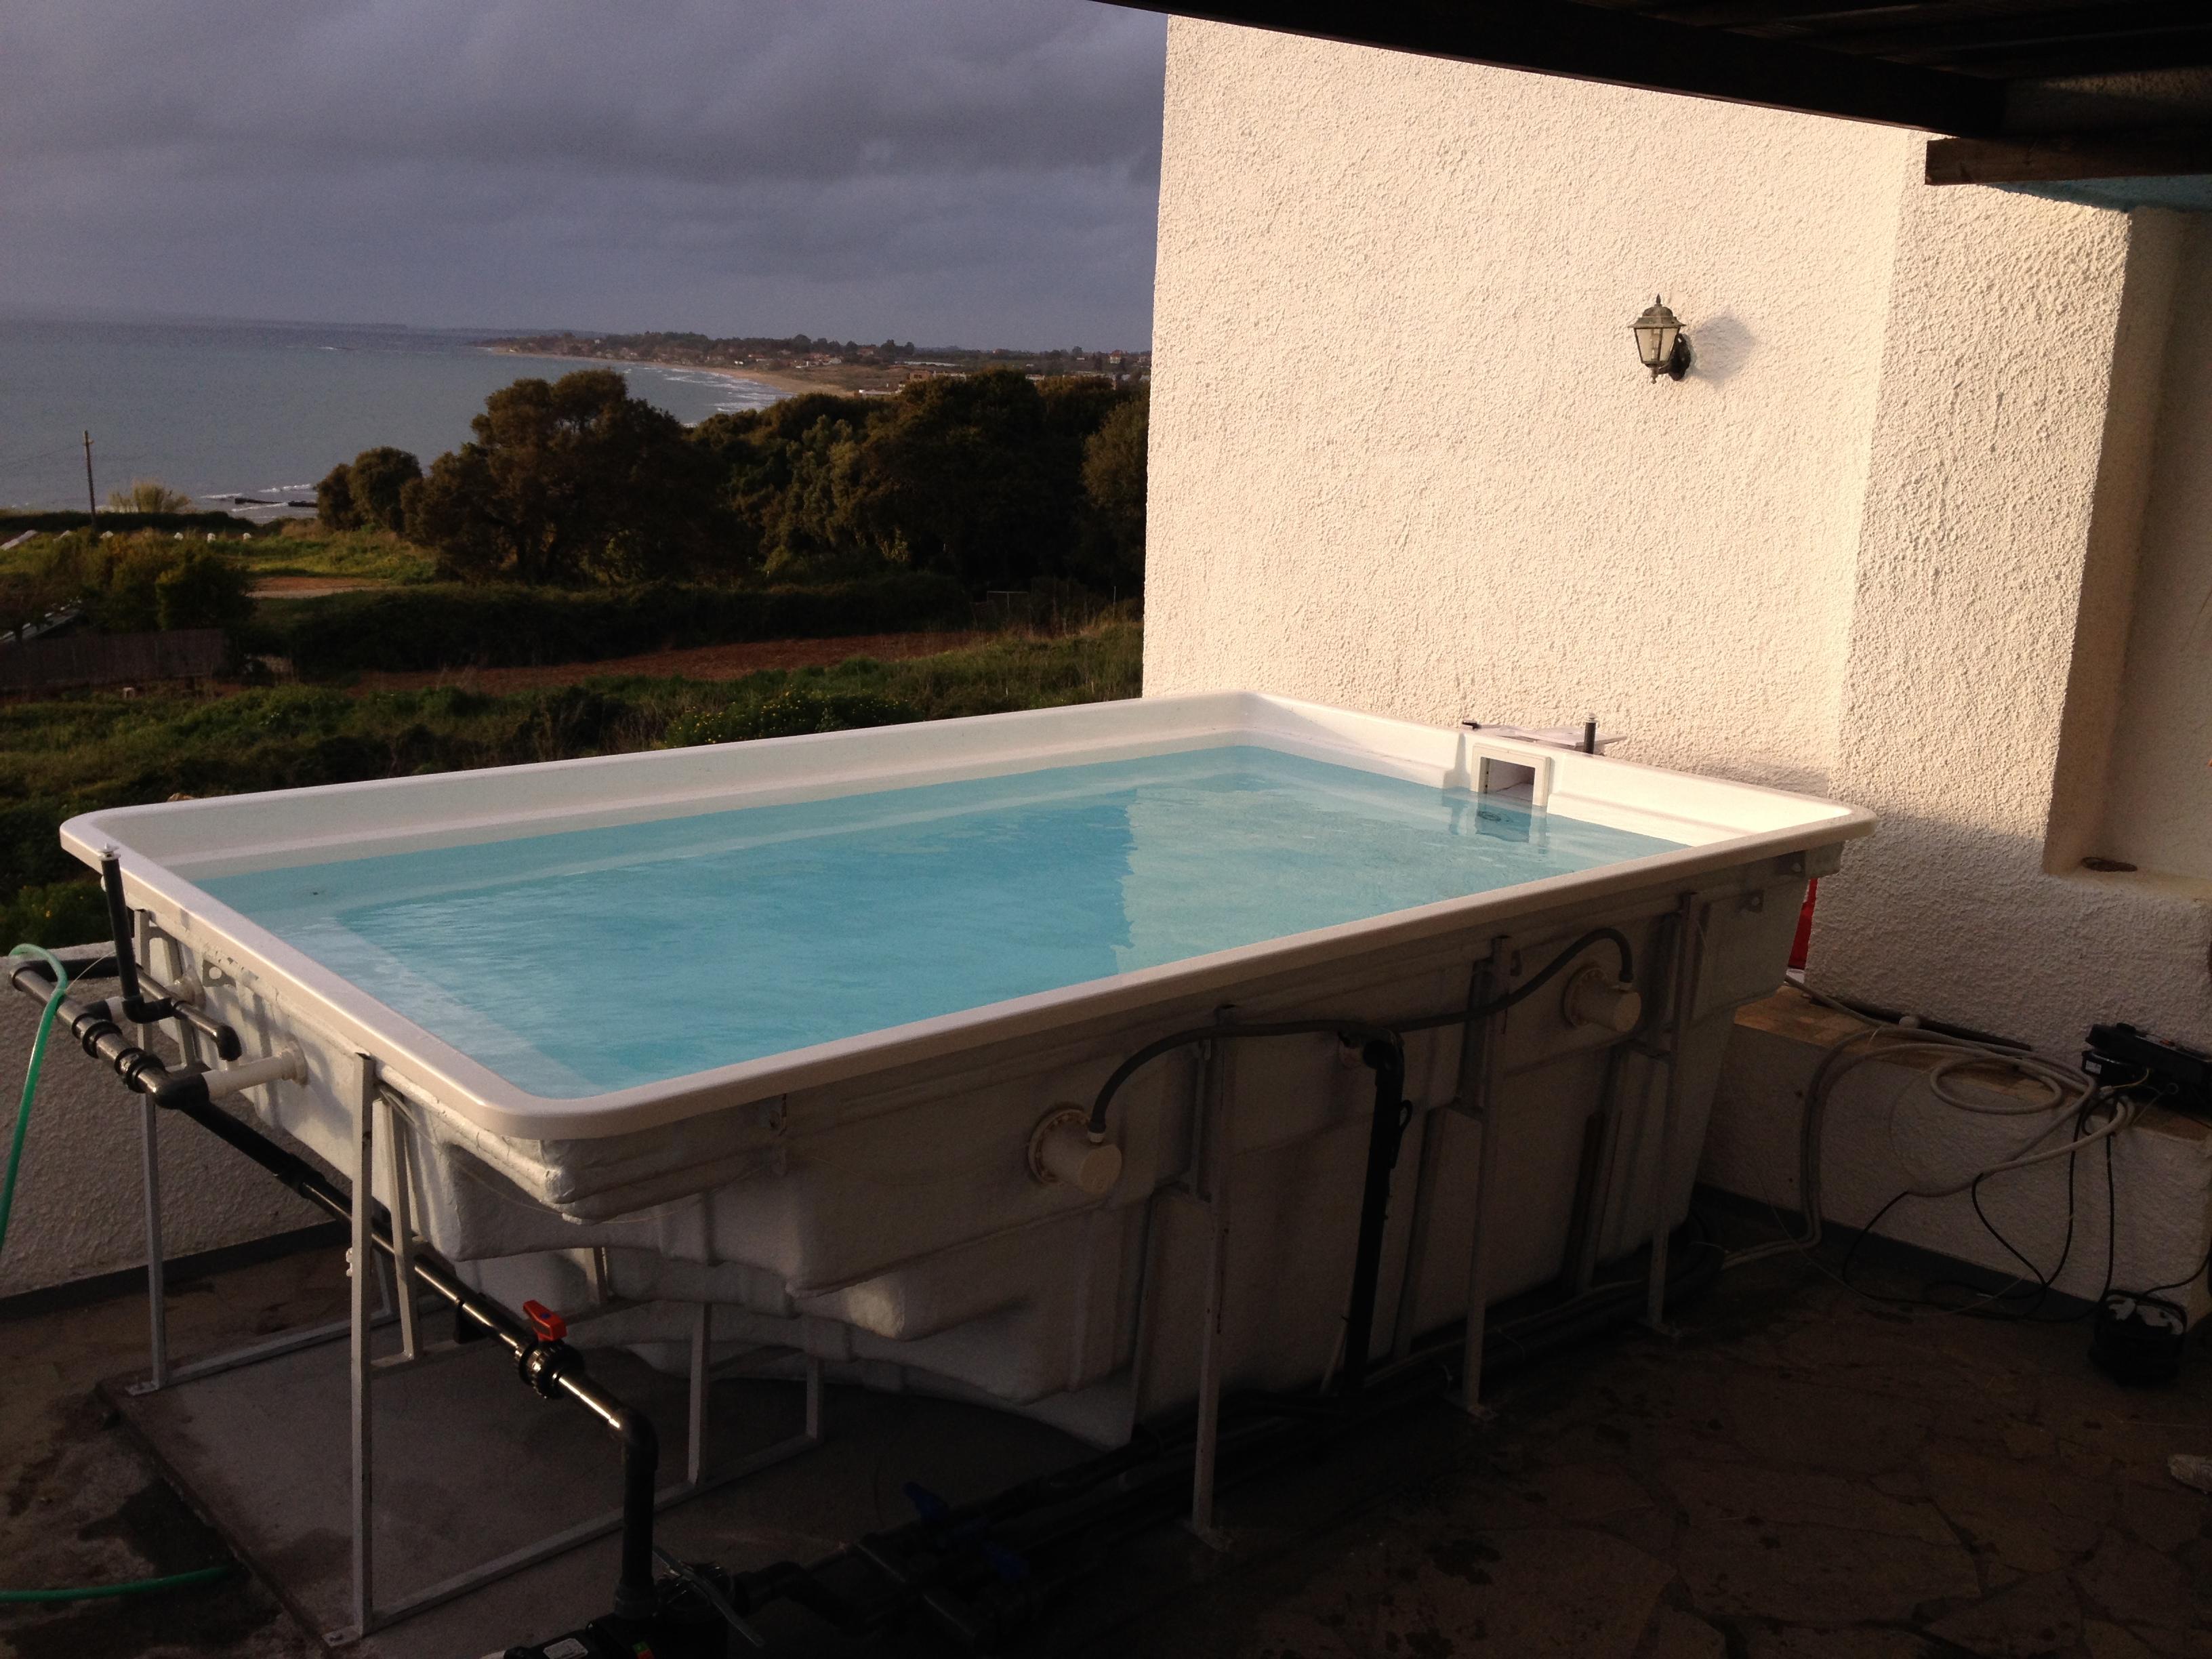 Pool plus spa ypsilon prefabricated swimming pool spa for Premade pools